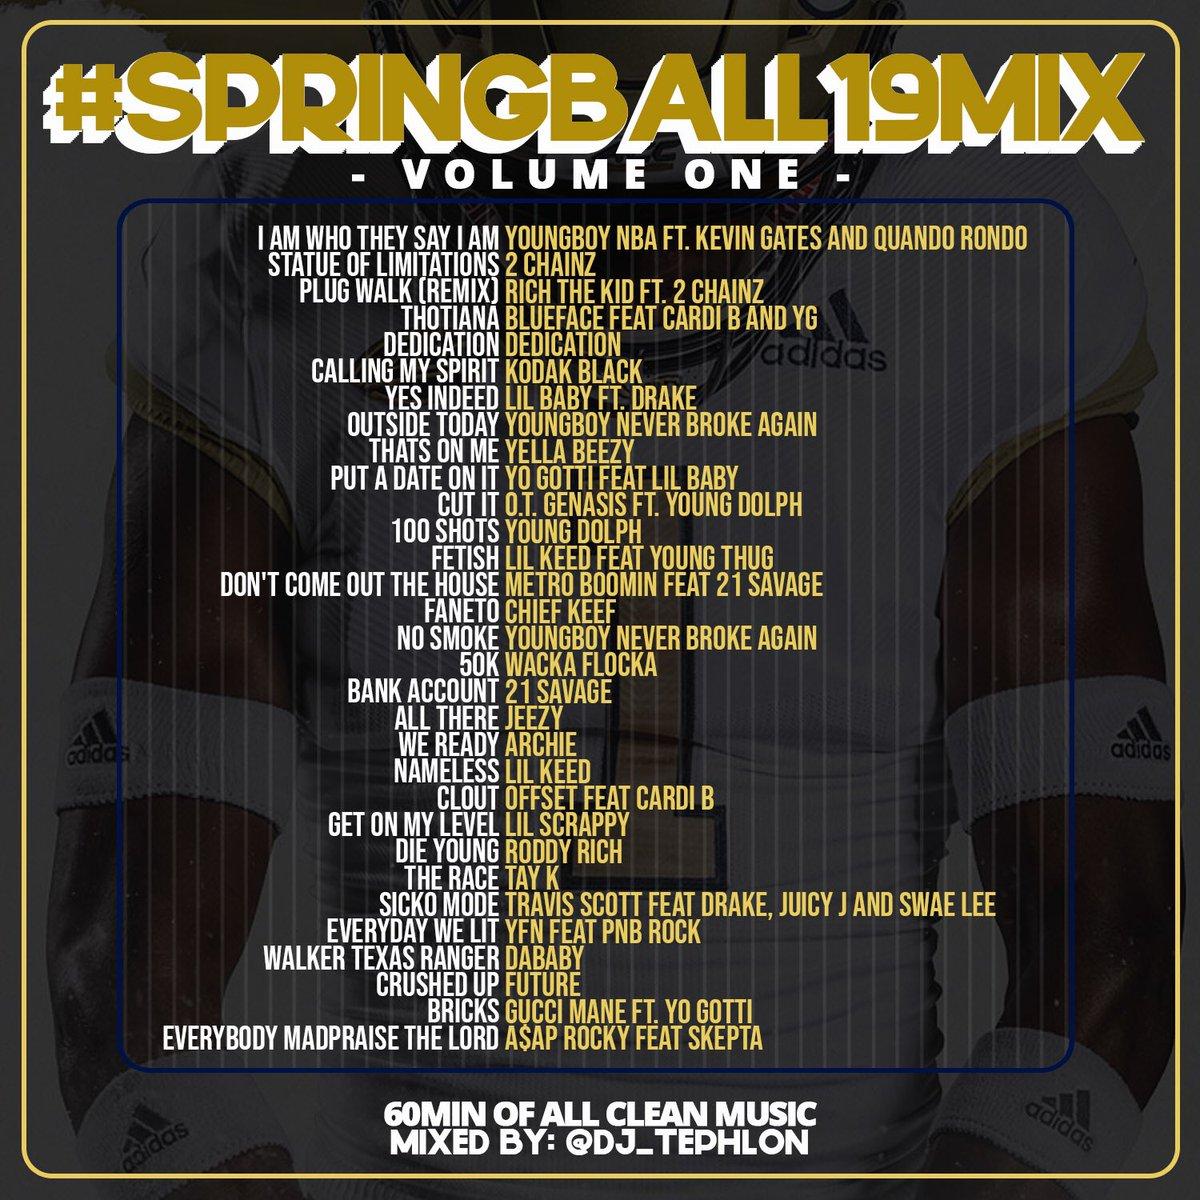 SpringBall19Mix hashtag on Twitter